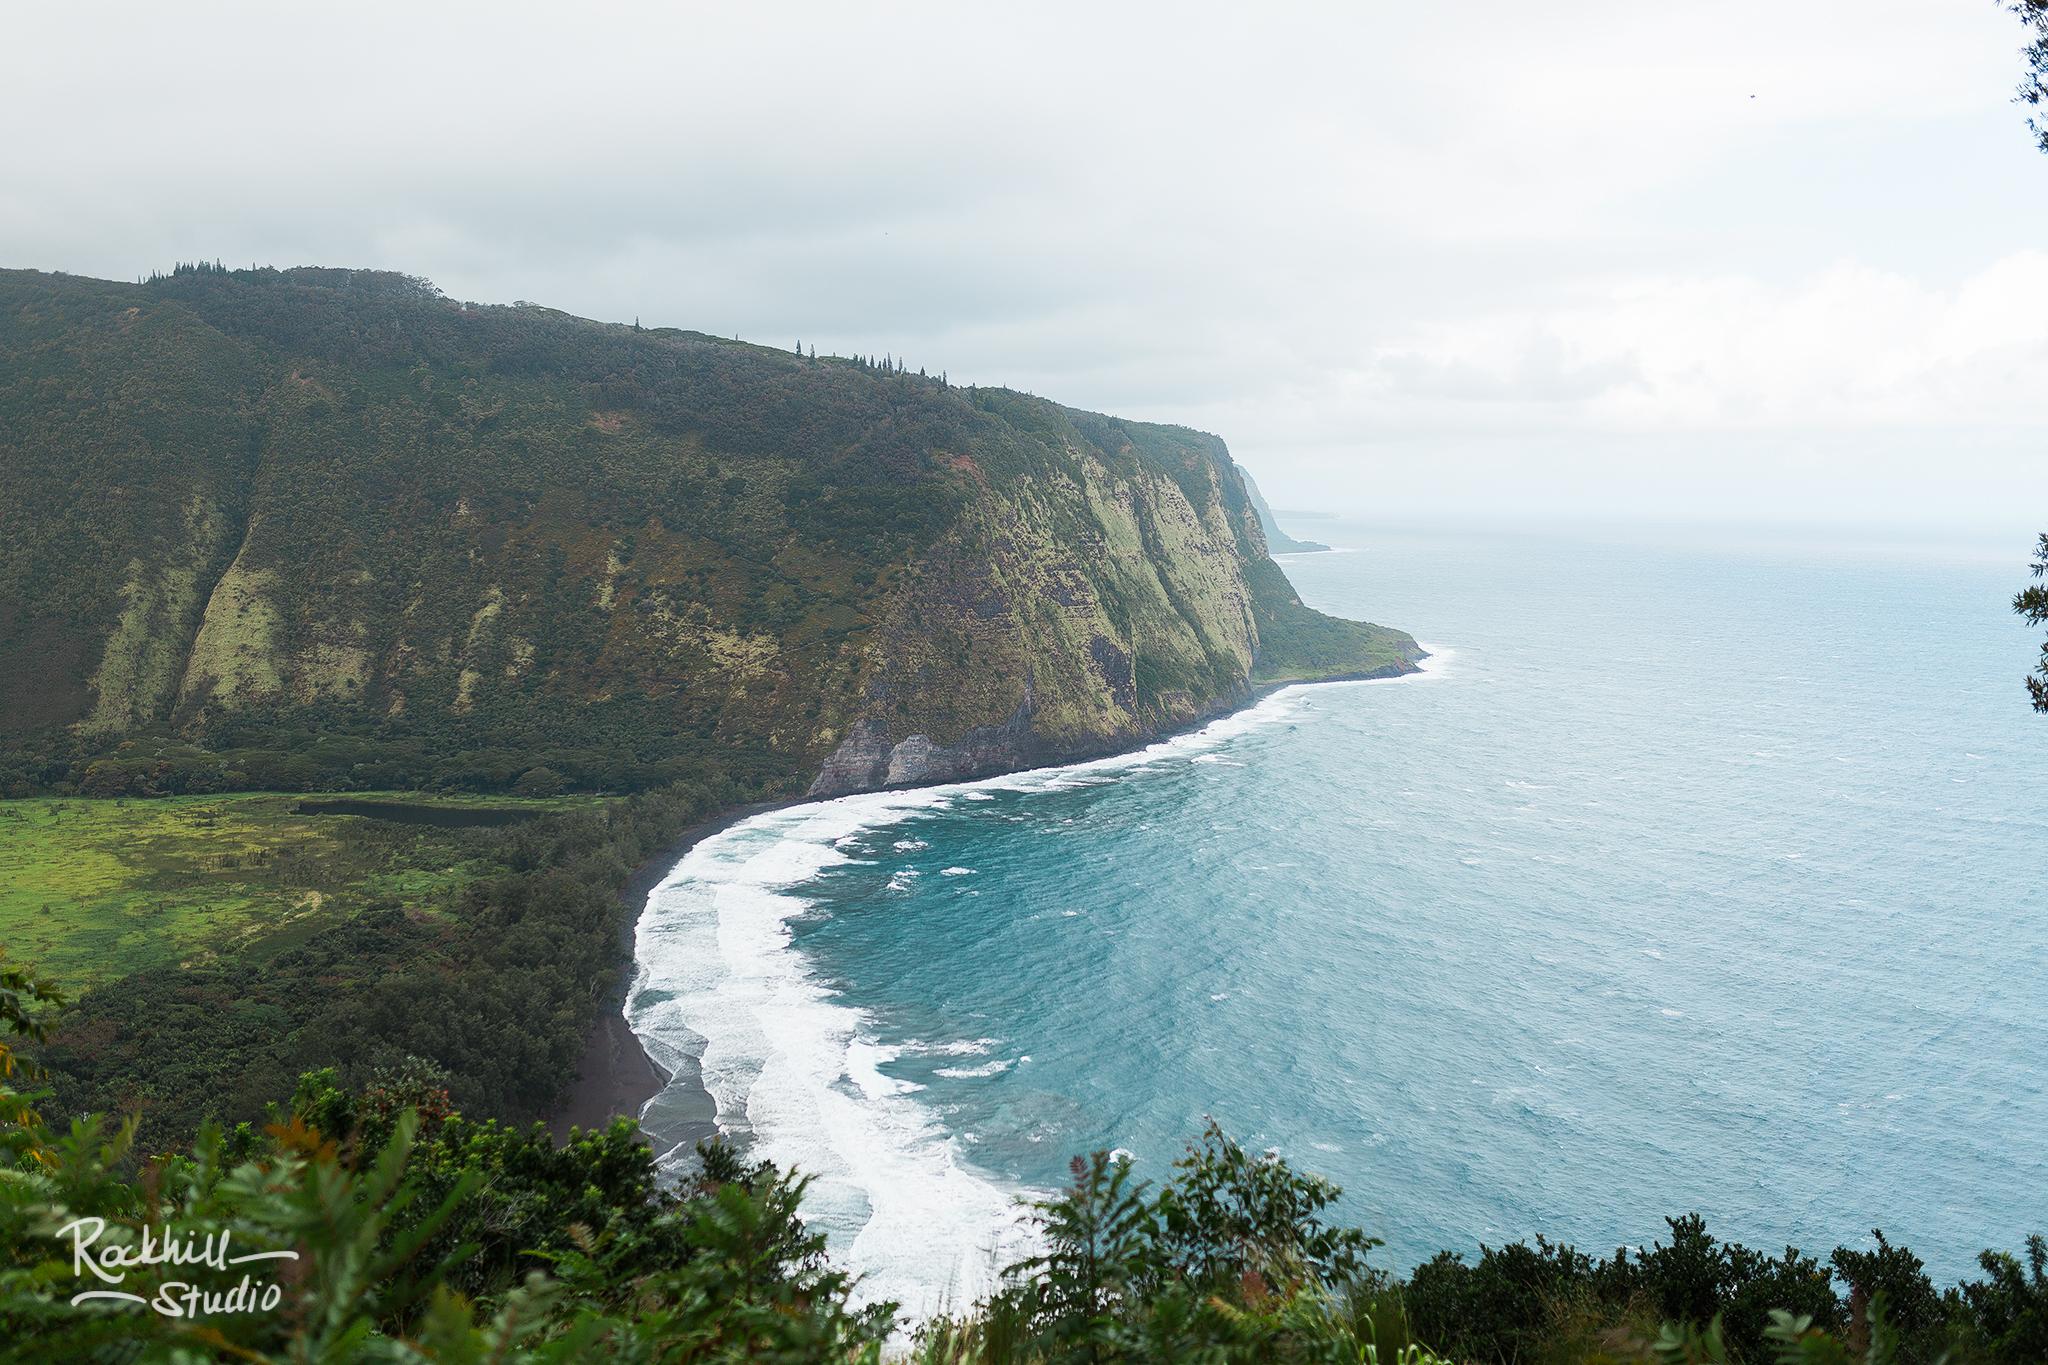 rockhill-studio-hawaii-vacation-ocean-hilo-michigan-photography-upper-peninsula